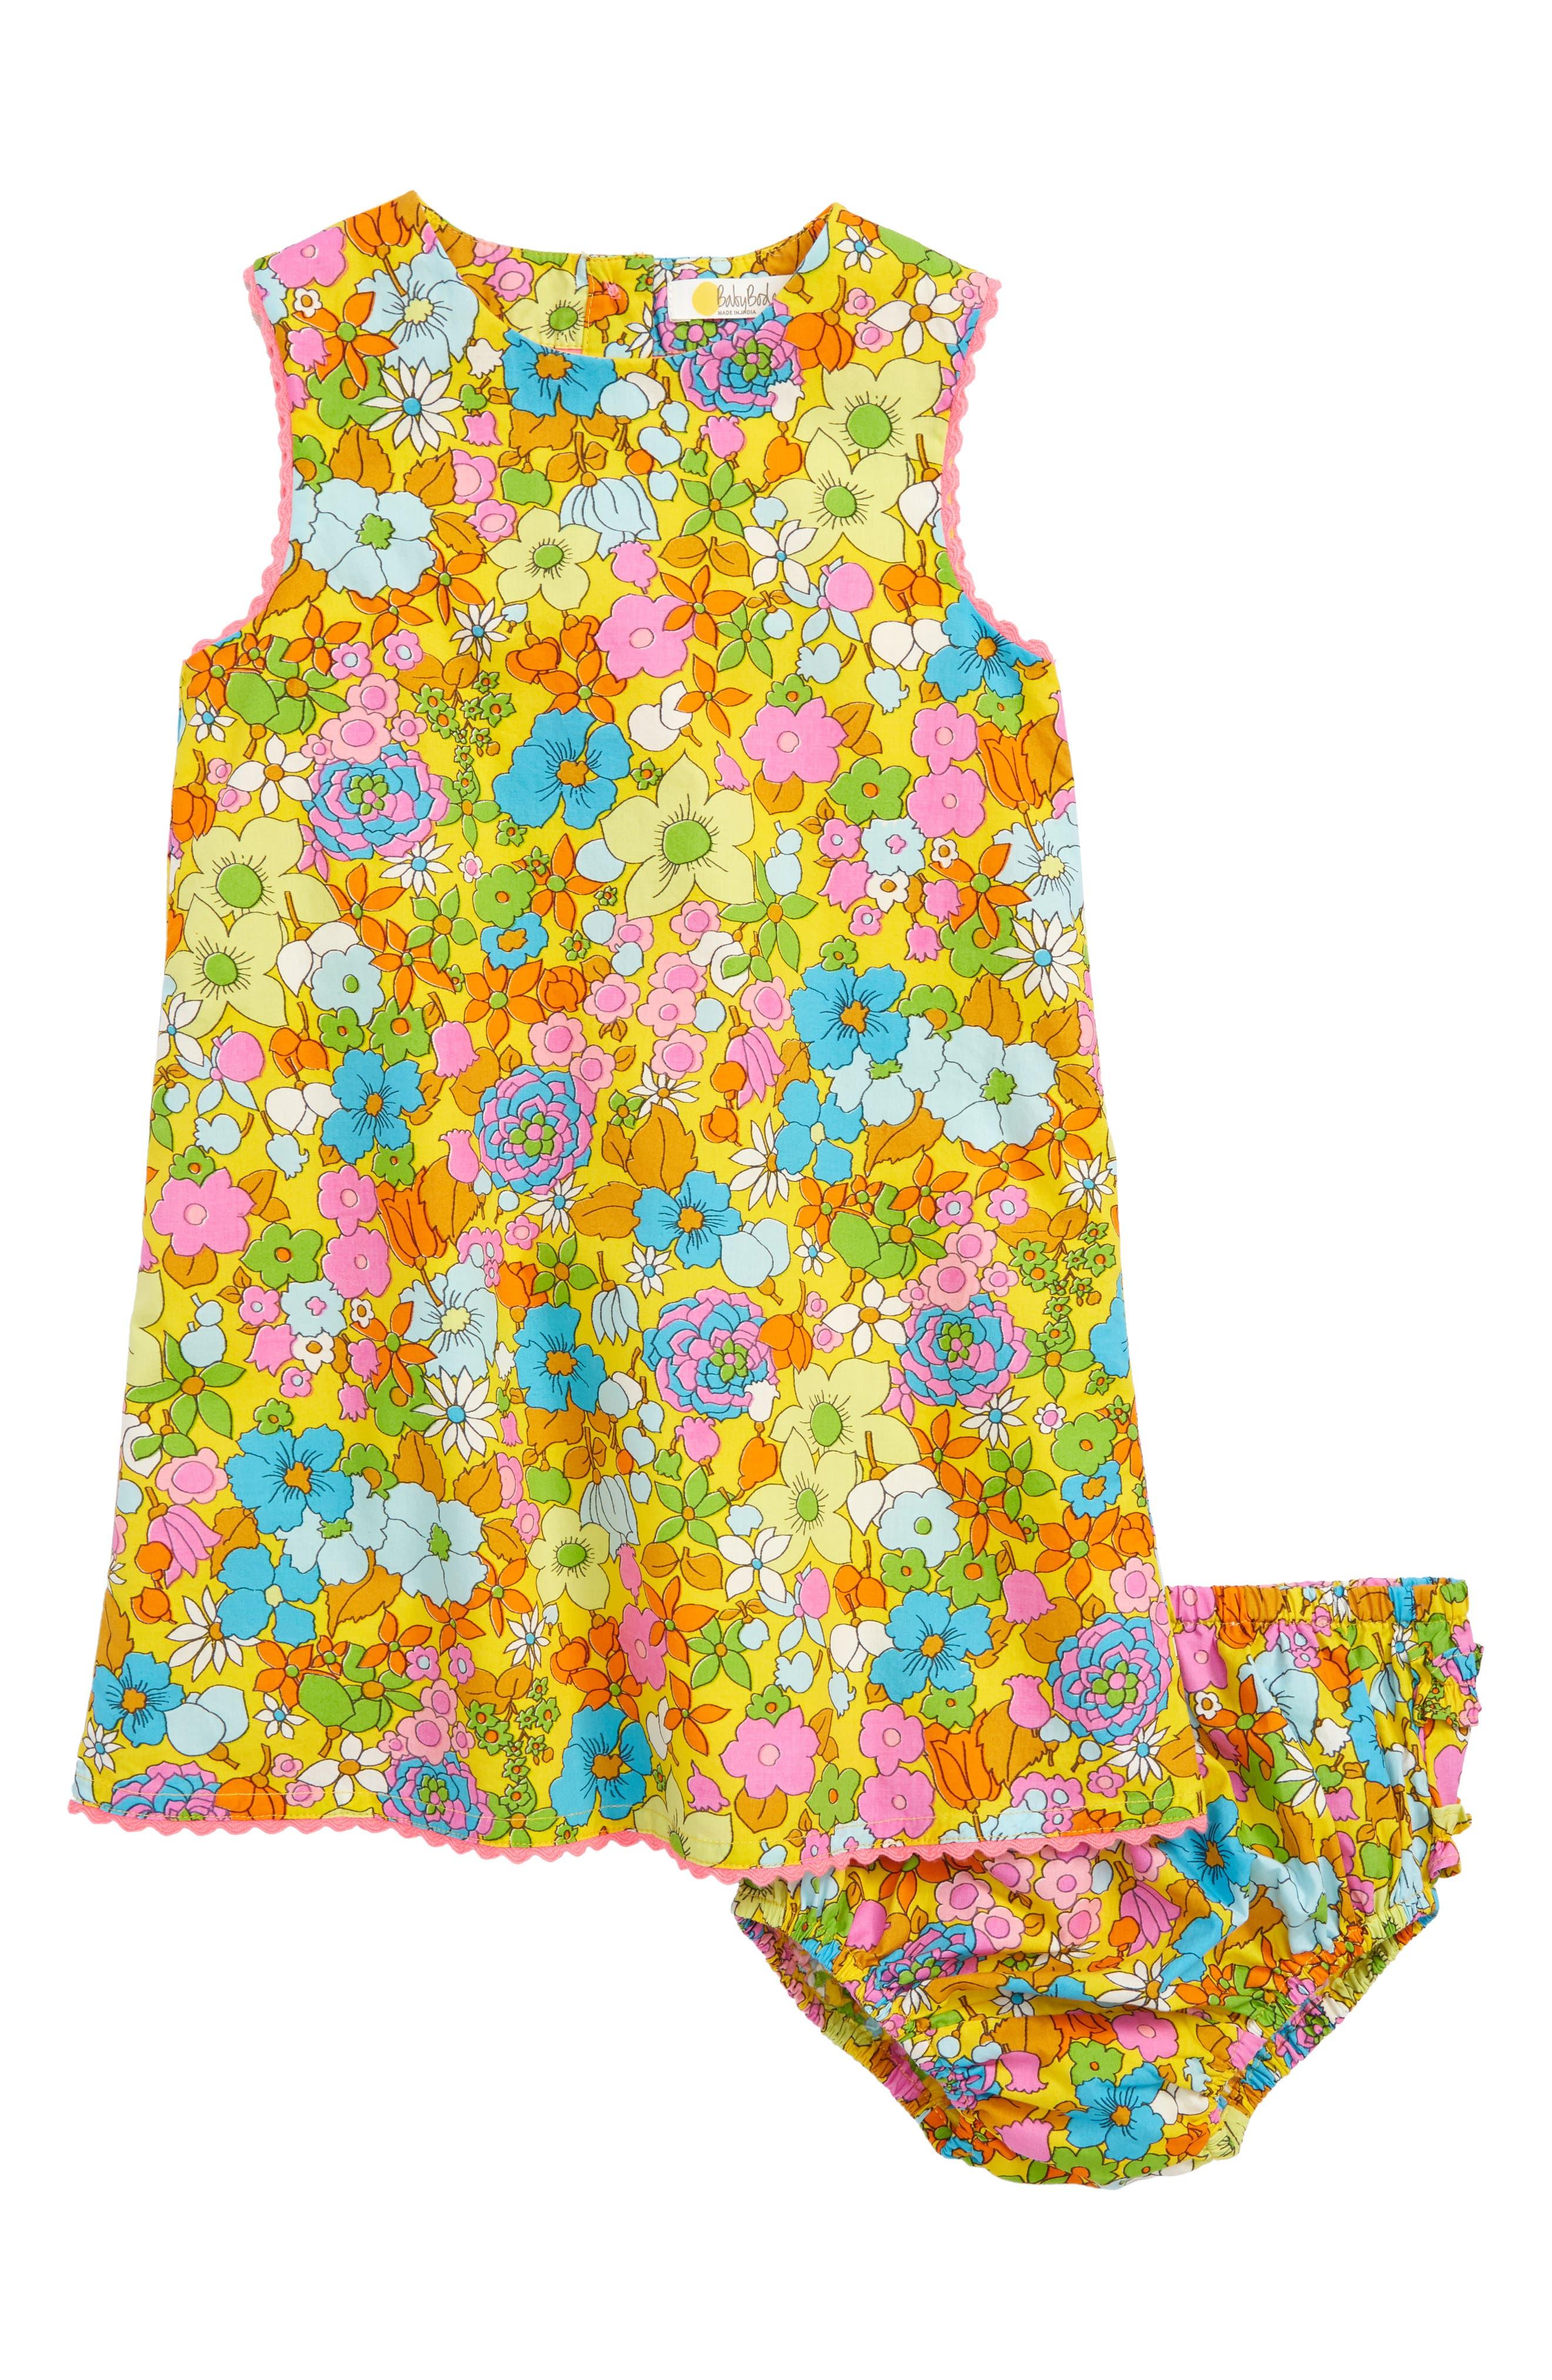 High Summer Woven Lace Dress,                             Main thumbnail 1, color,                             700